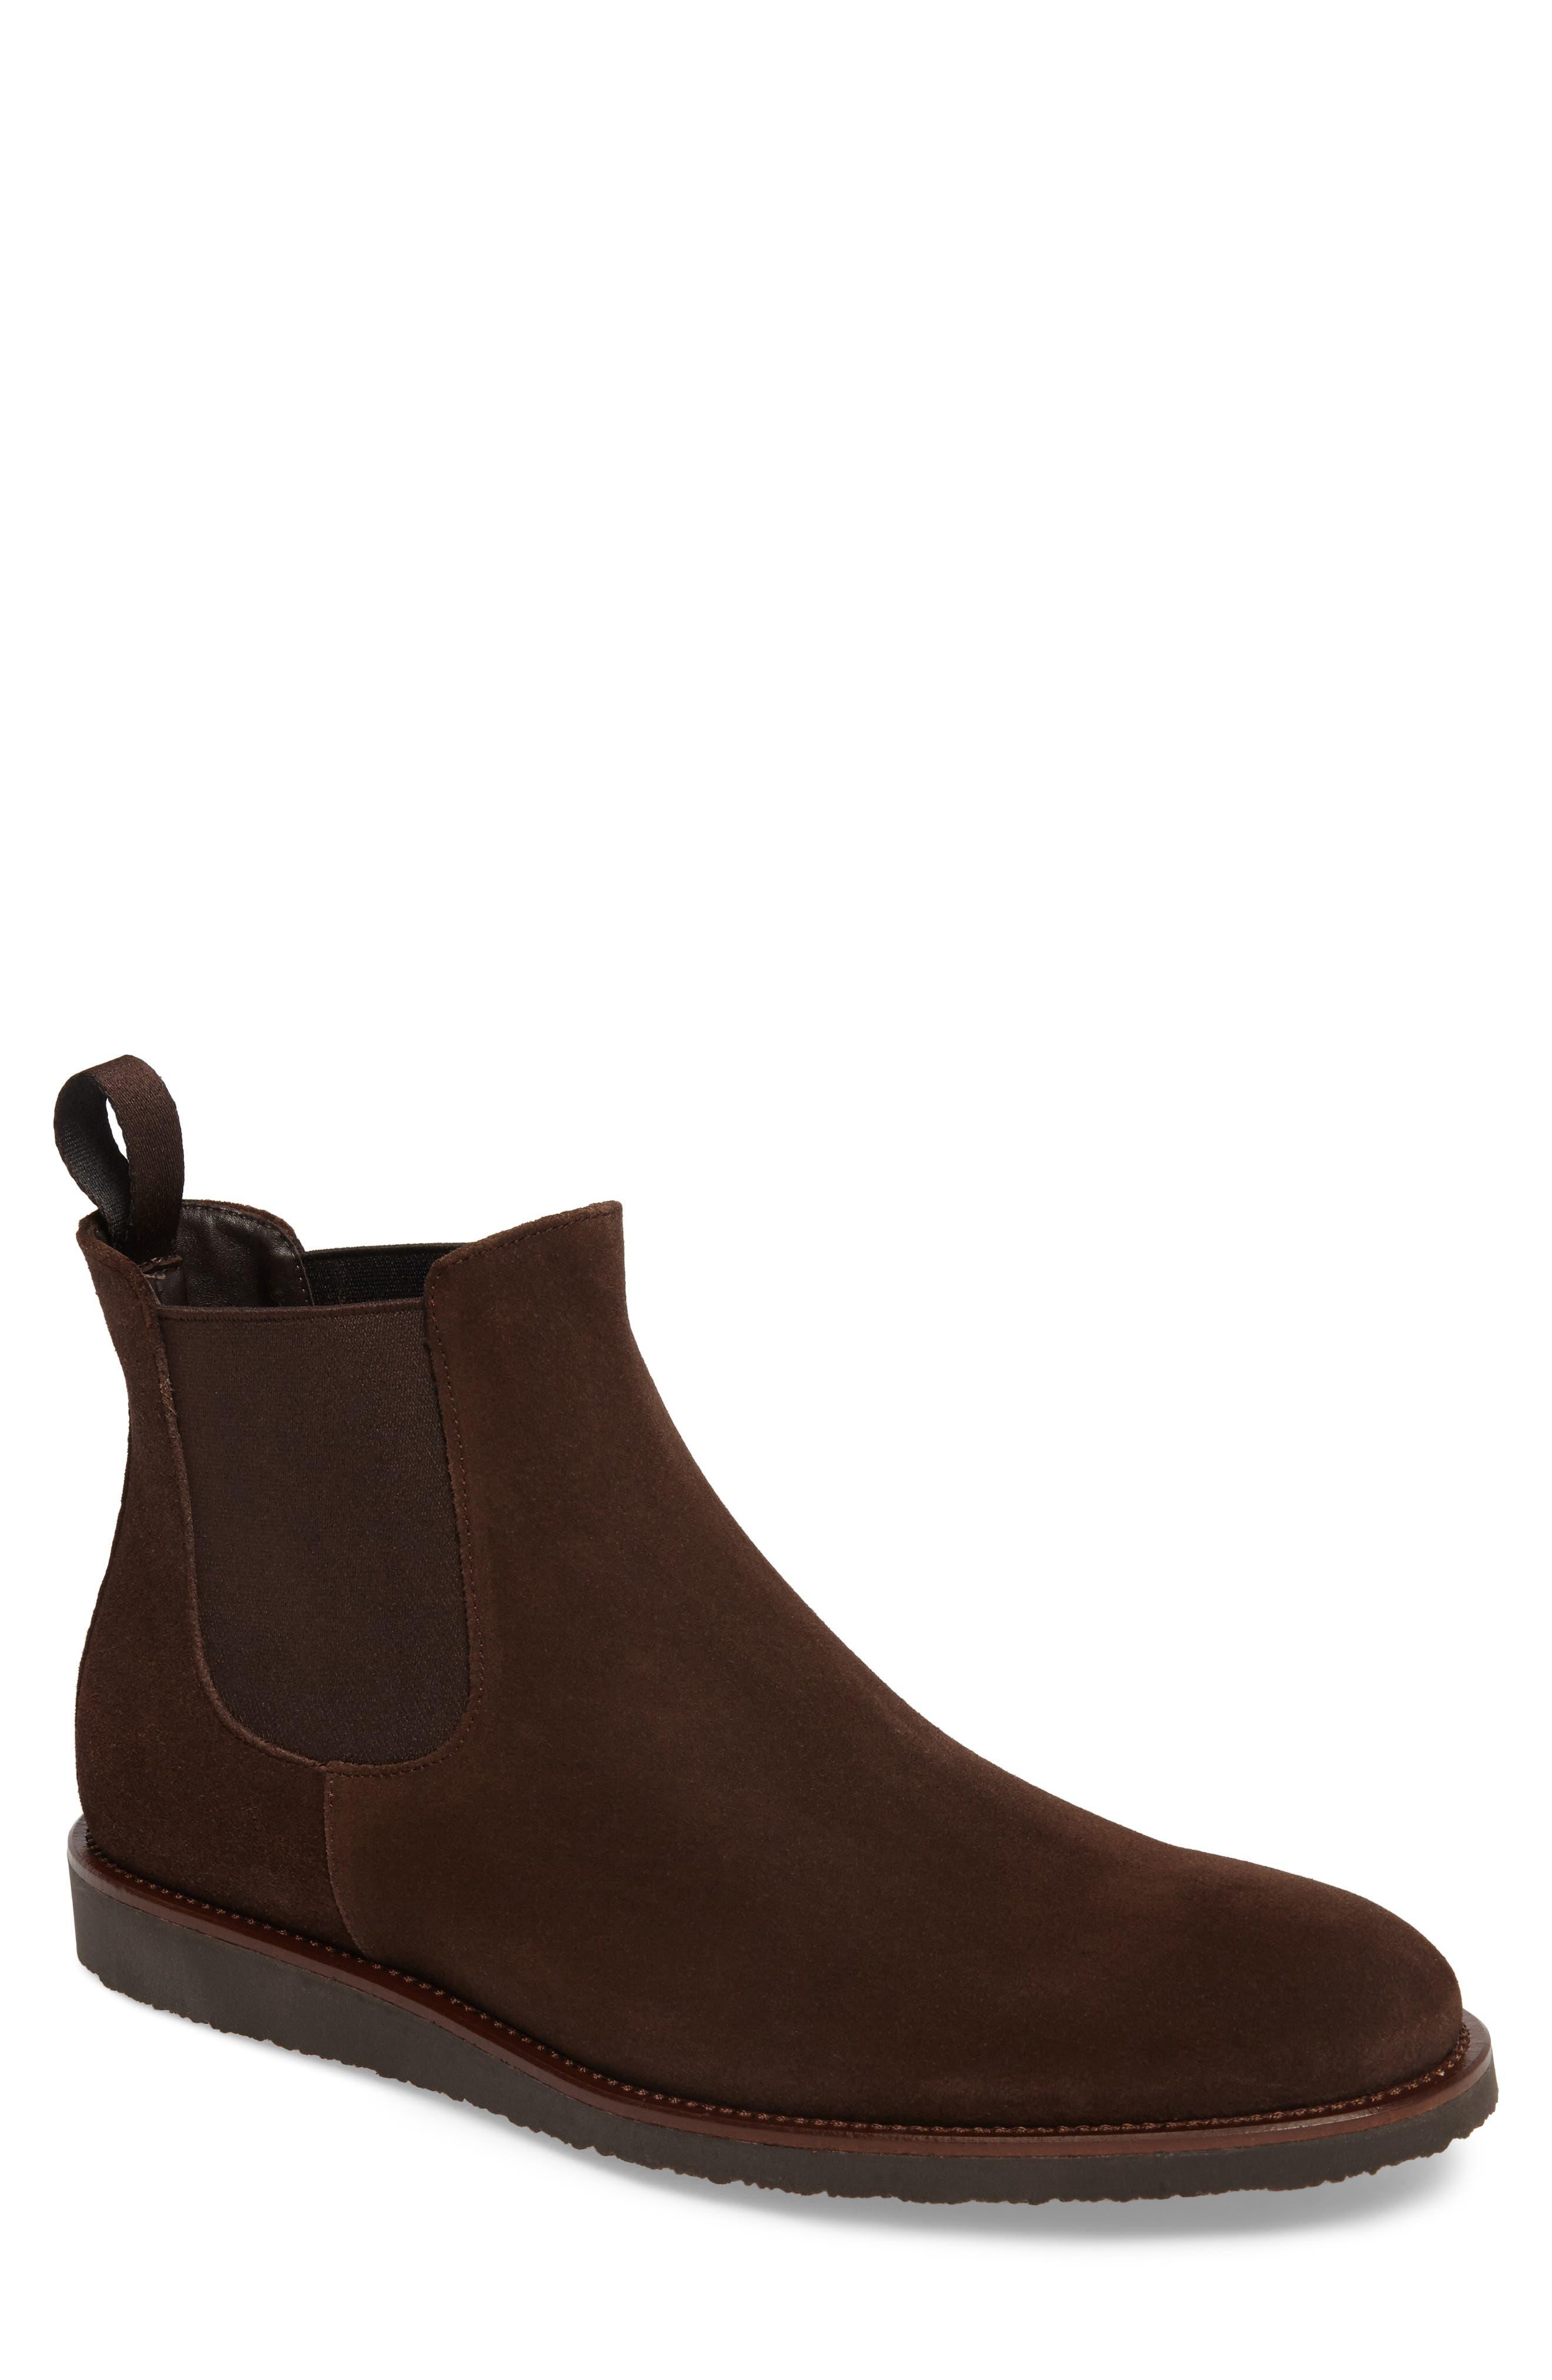 Corden Chelsea Boot,                         Main,                         color, 201